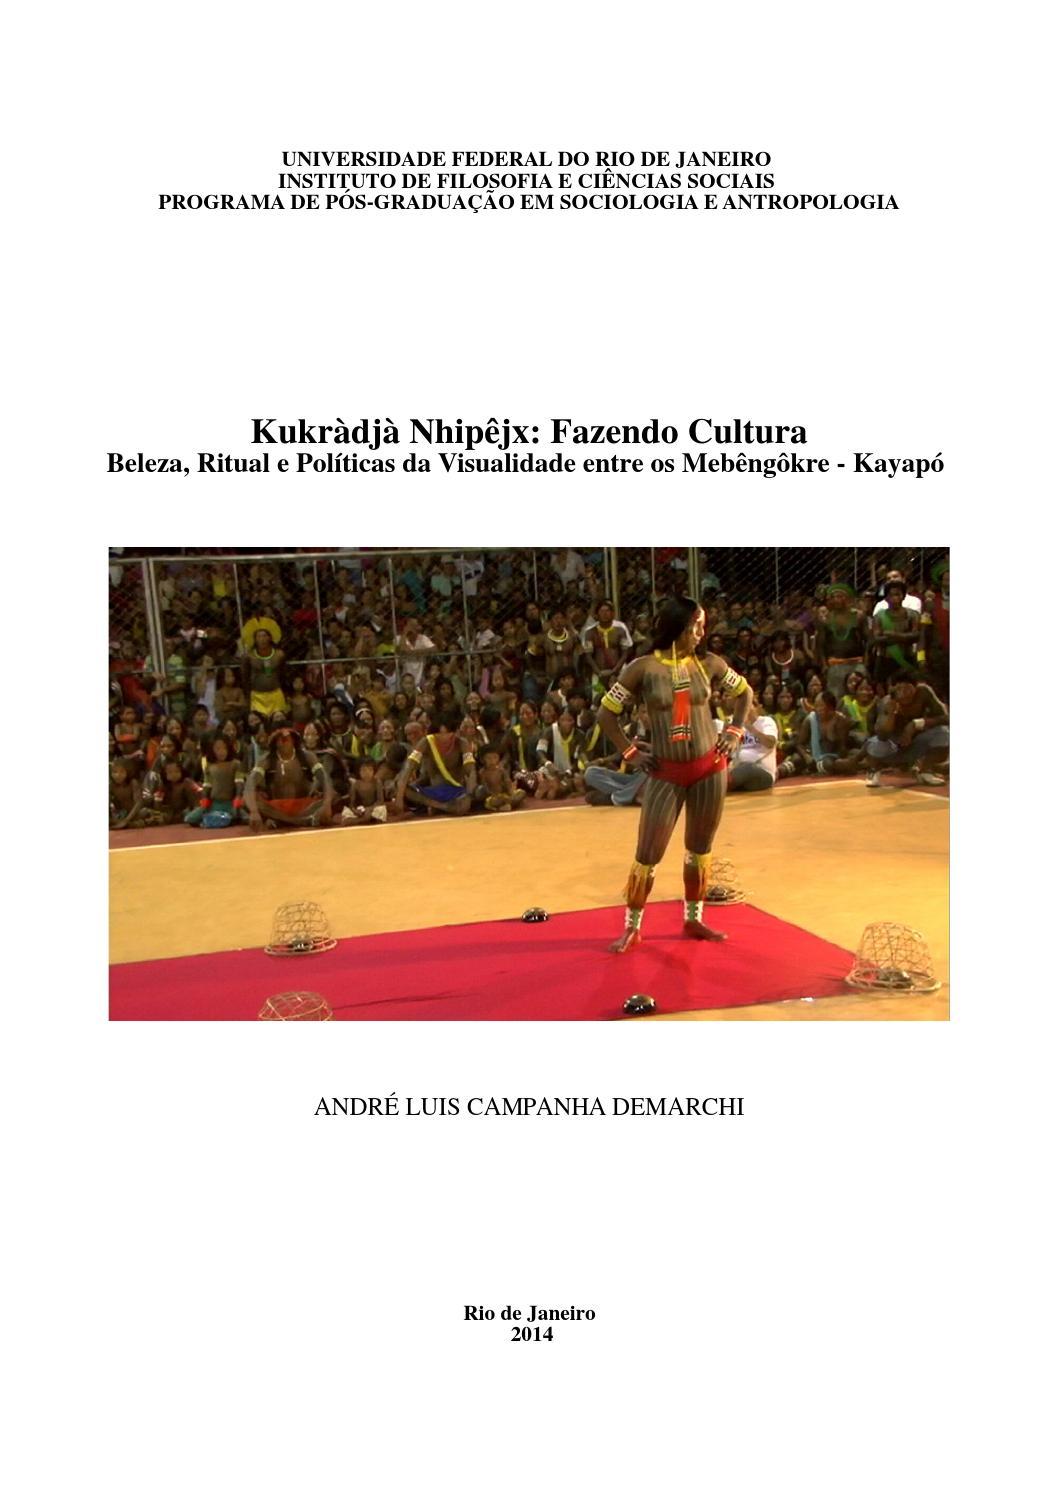 9aa4765440 Kukradja nhipejx fazendo cultura by andre demarchi - issuu